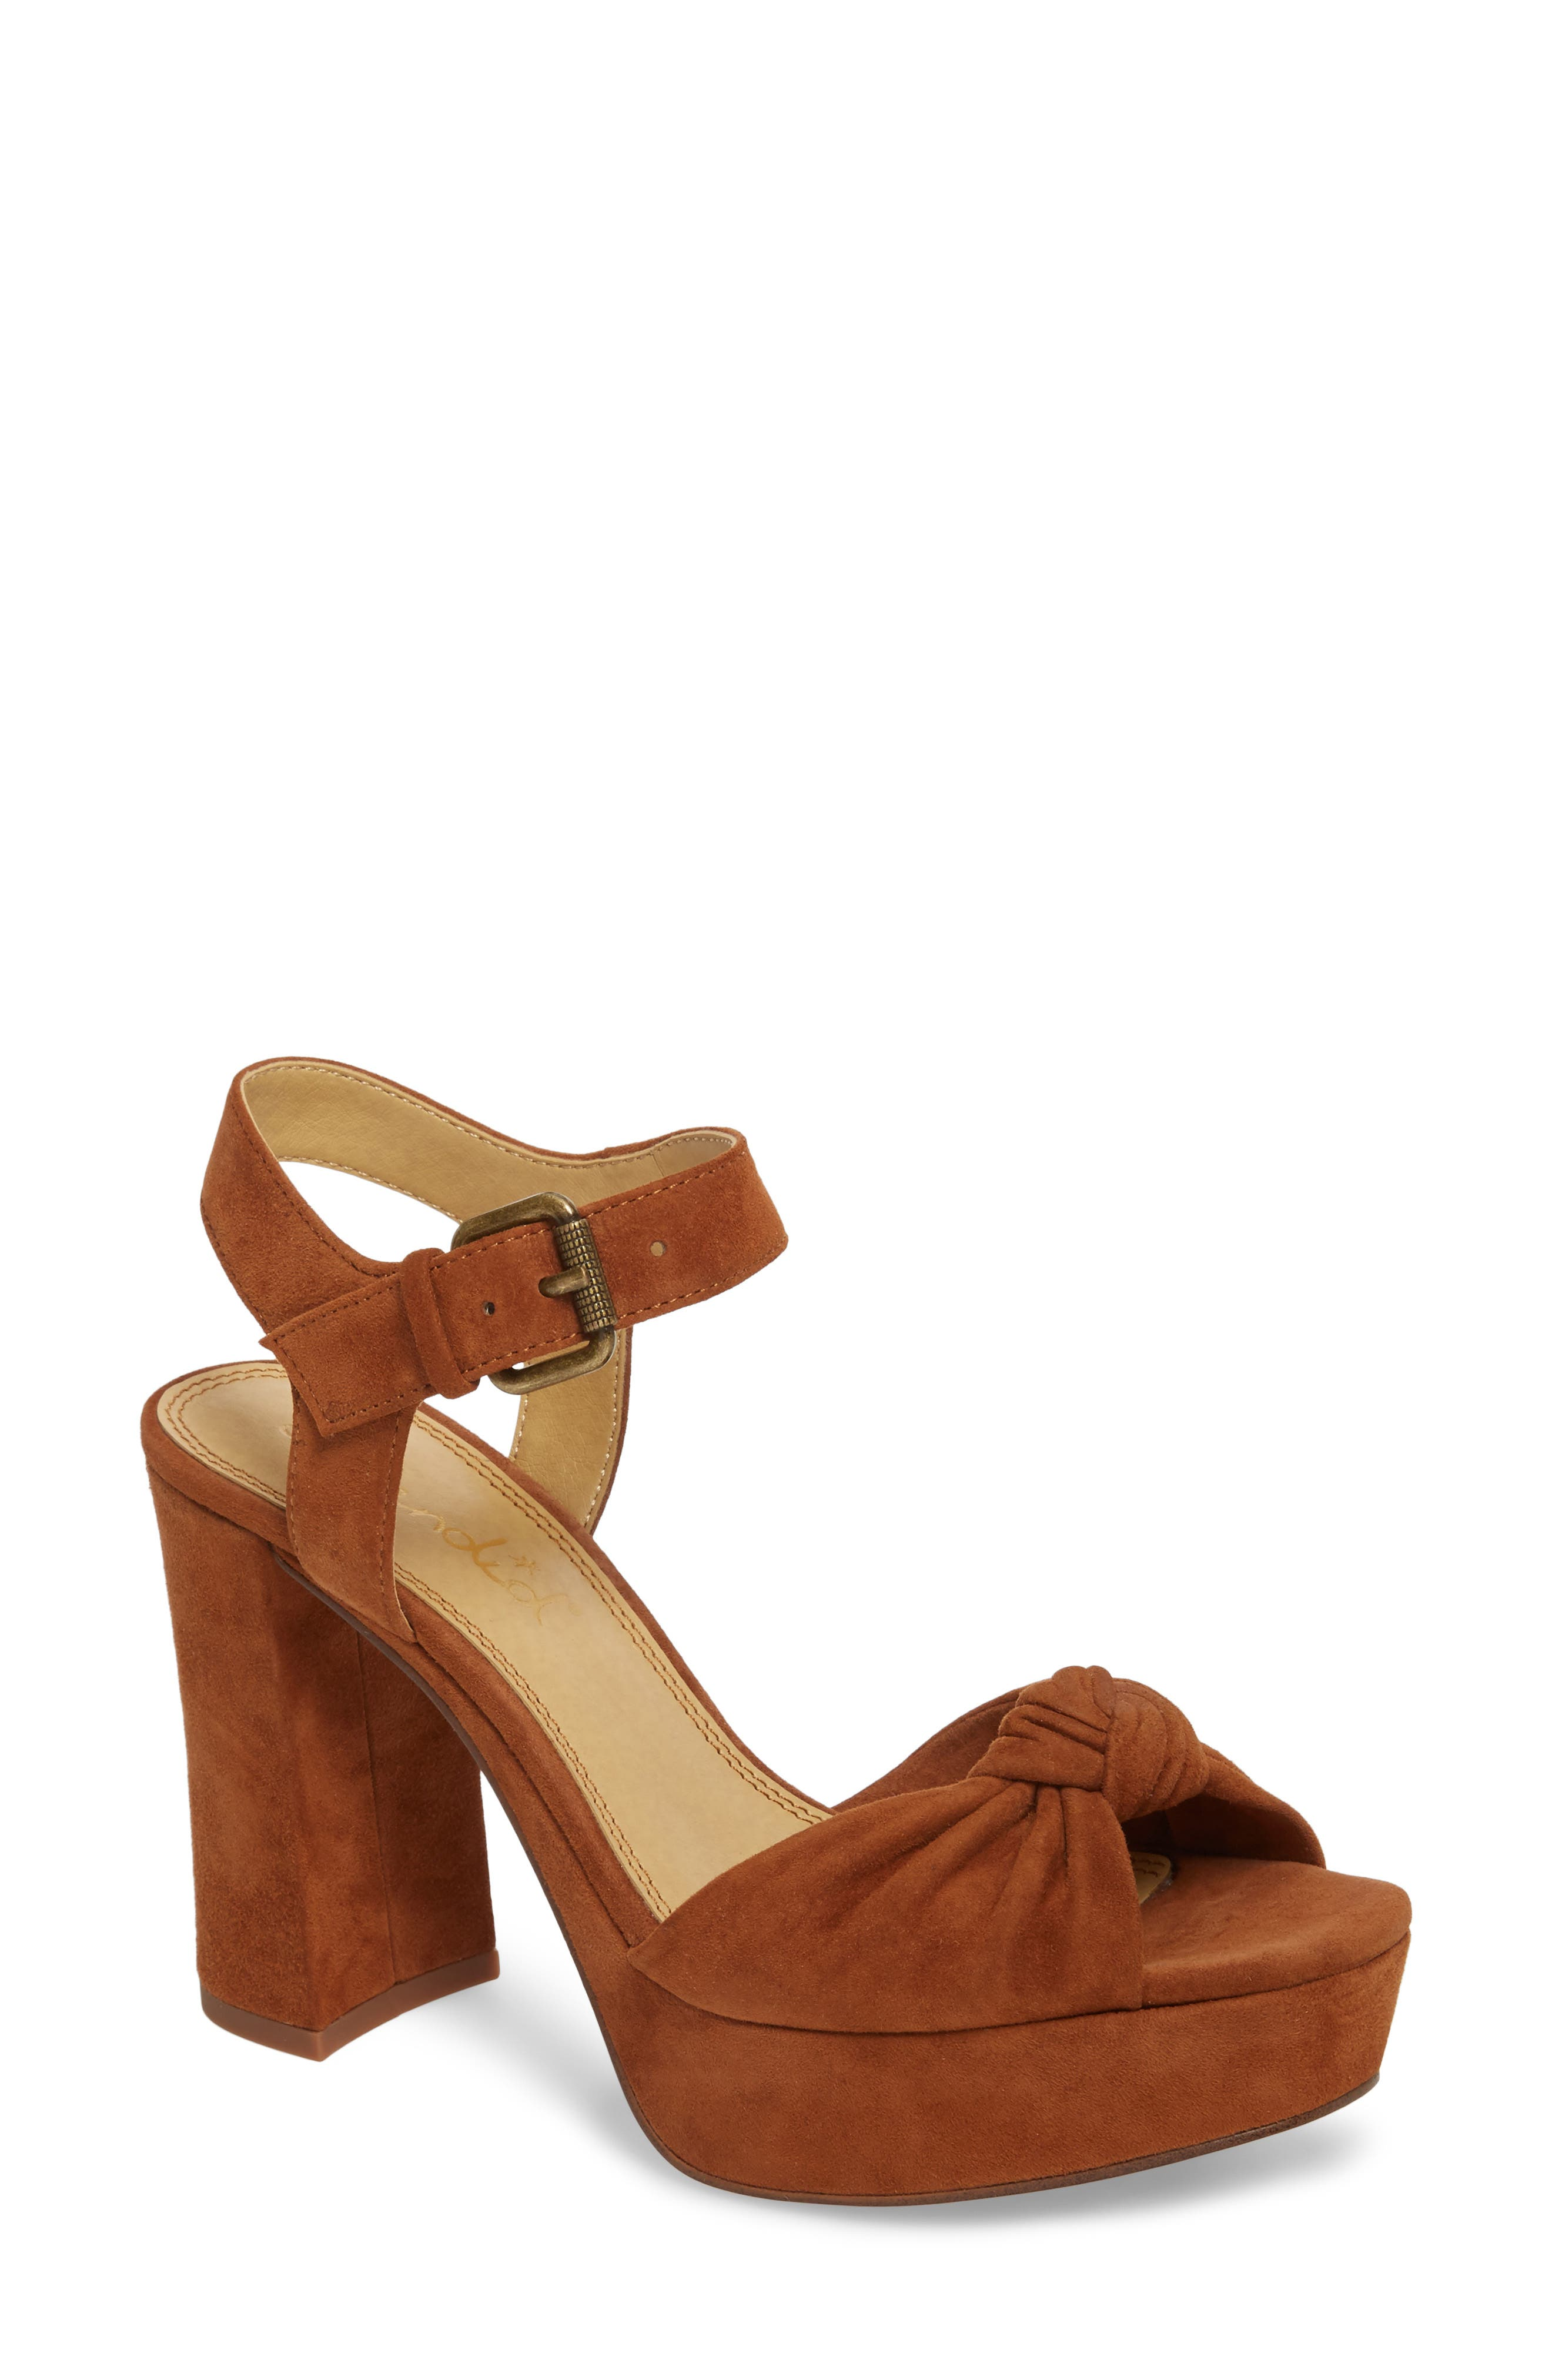 Bates Platform Sandal,                             Main thumbnail 1, color,                             Caramel Suede